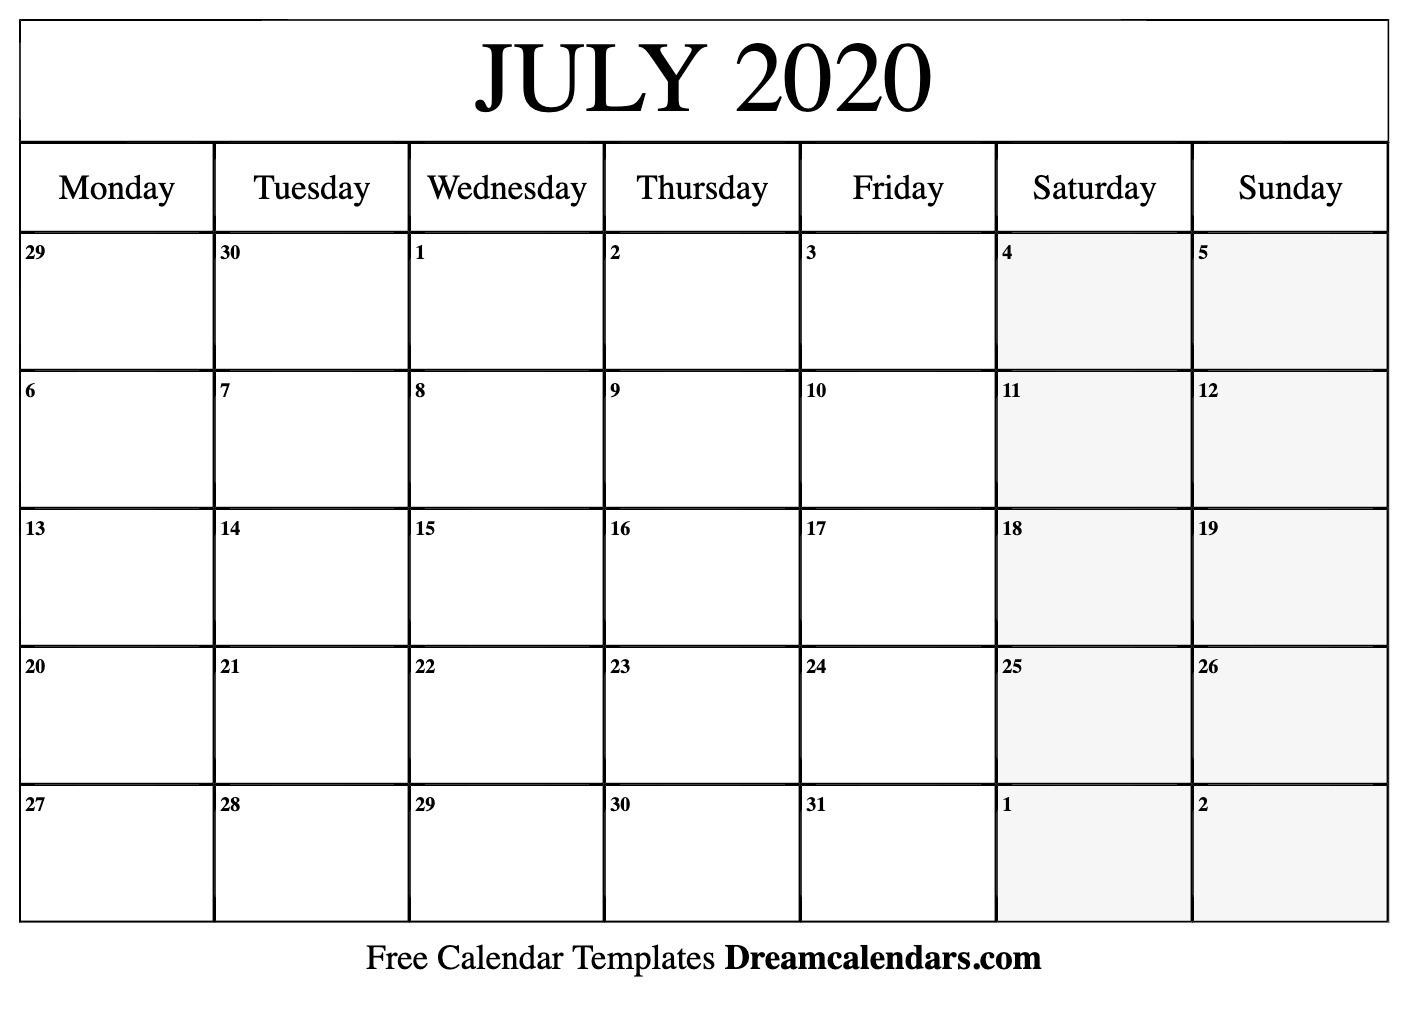 Printable July 2020 Calendar for Free Printable Fill In Calendars 2020